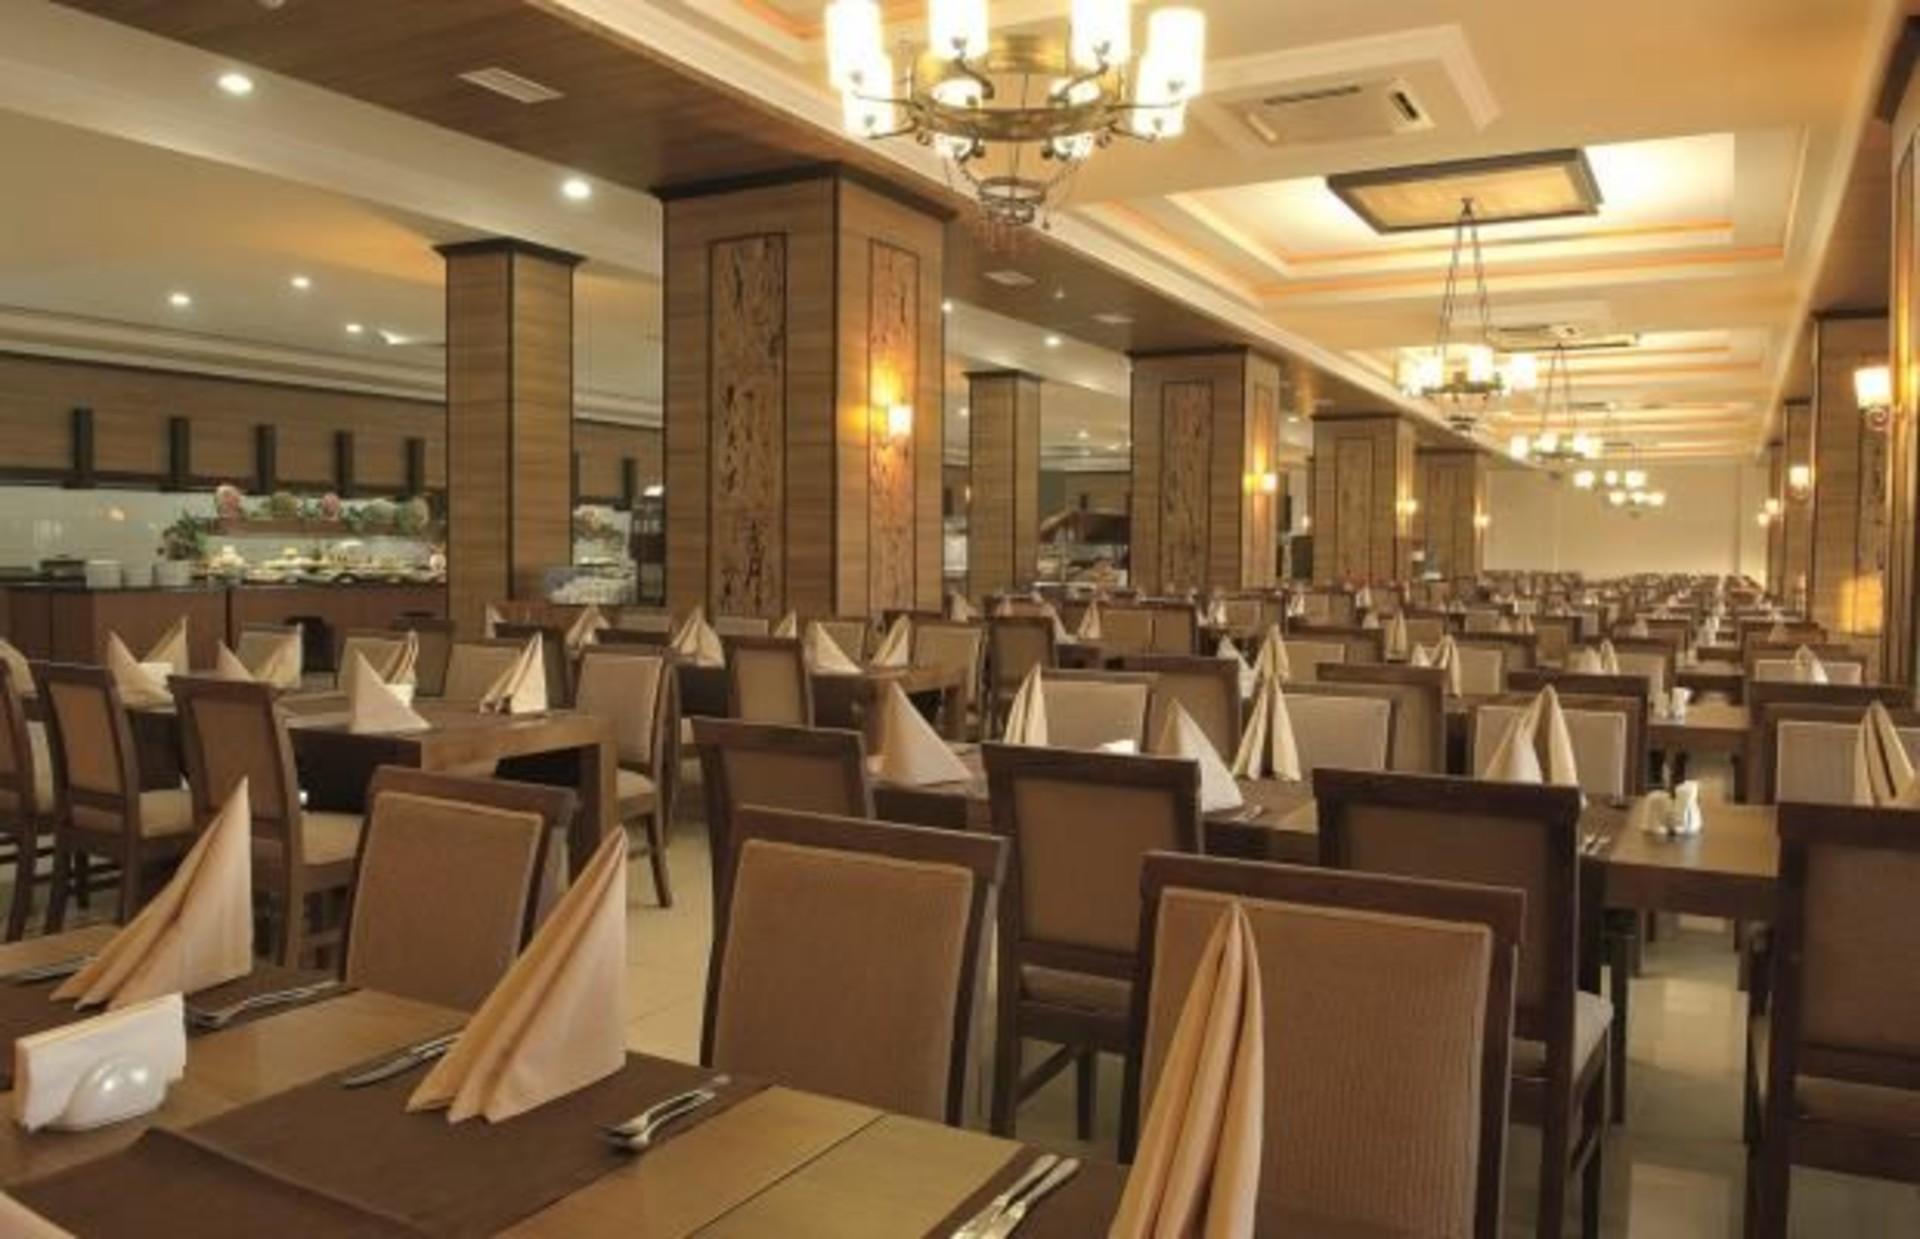 laphetos-hotel-1815008.jpg